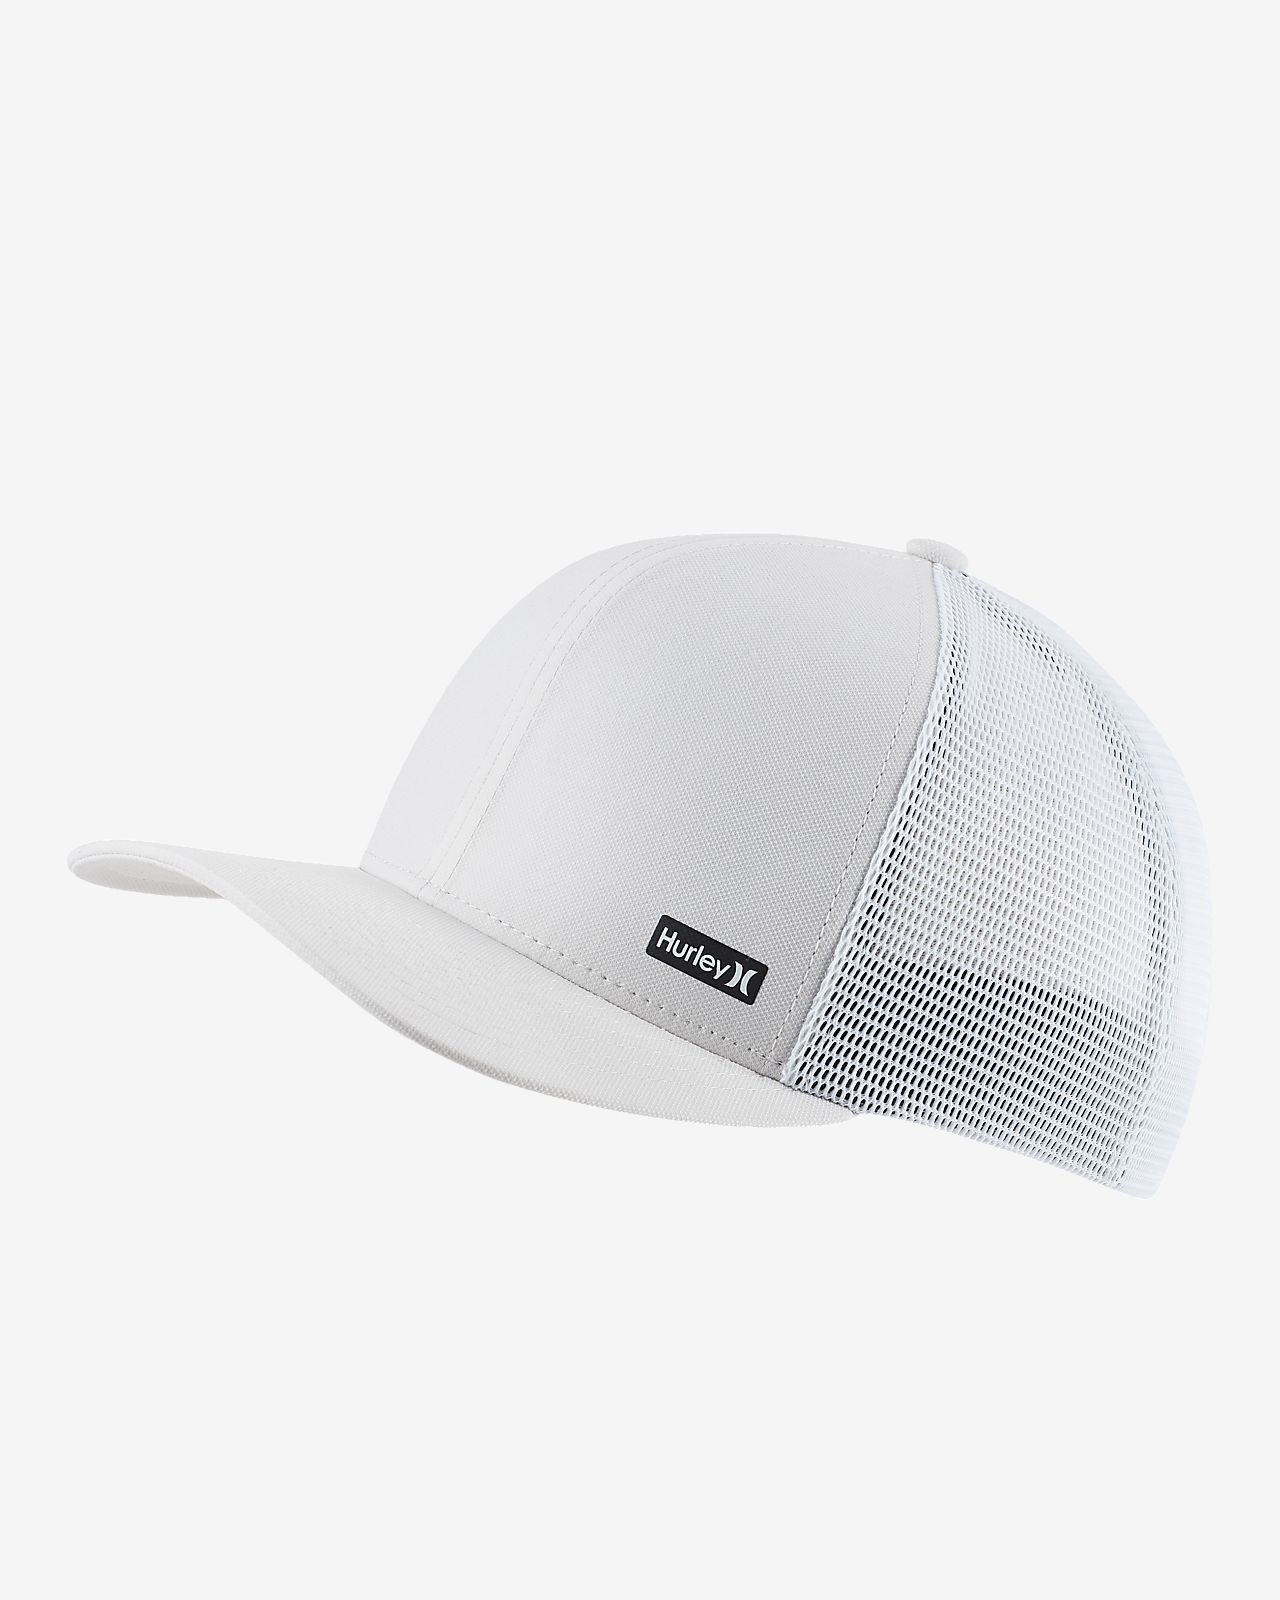 466e4b9487a67 Hurley League Adjustable Hat. Nike.com